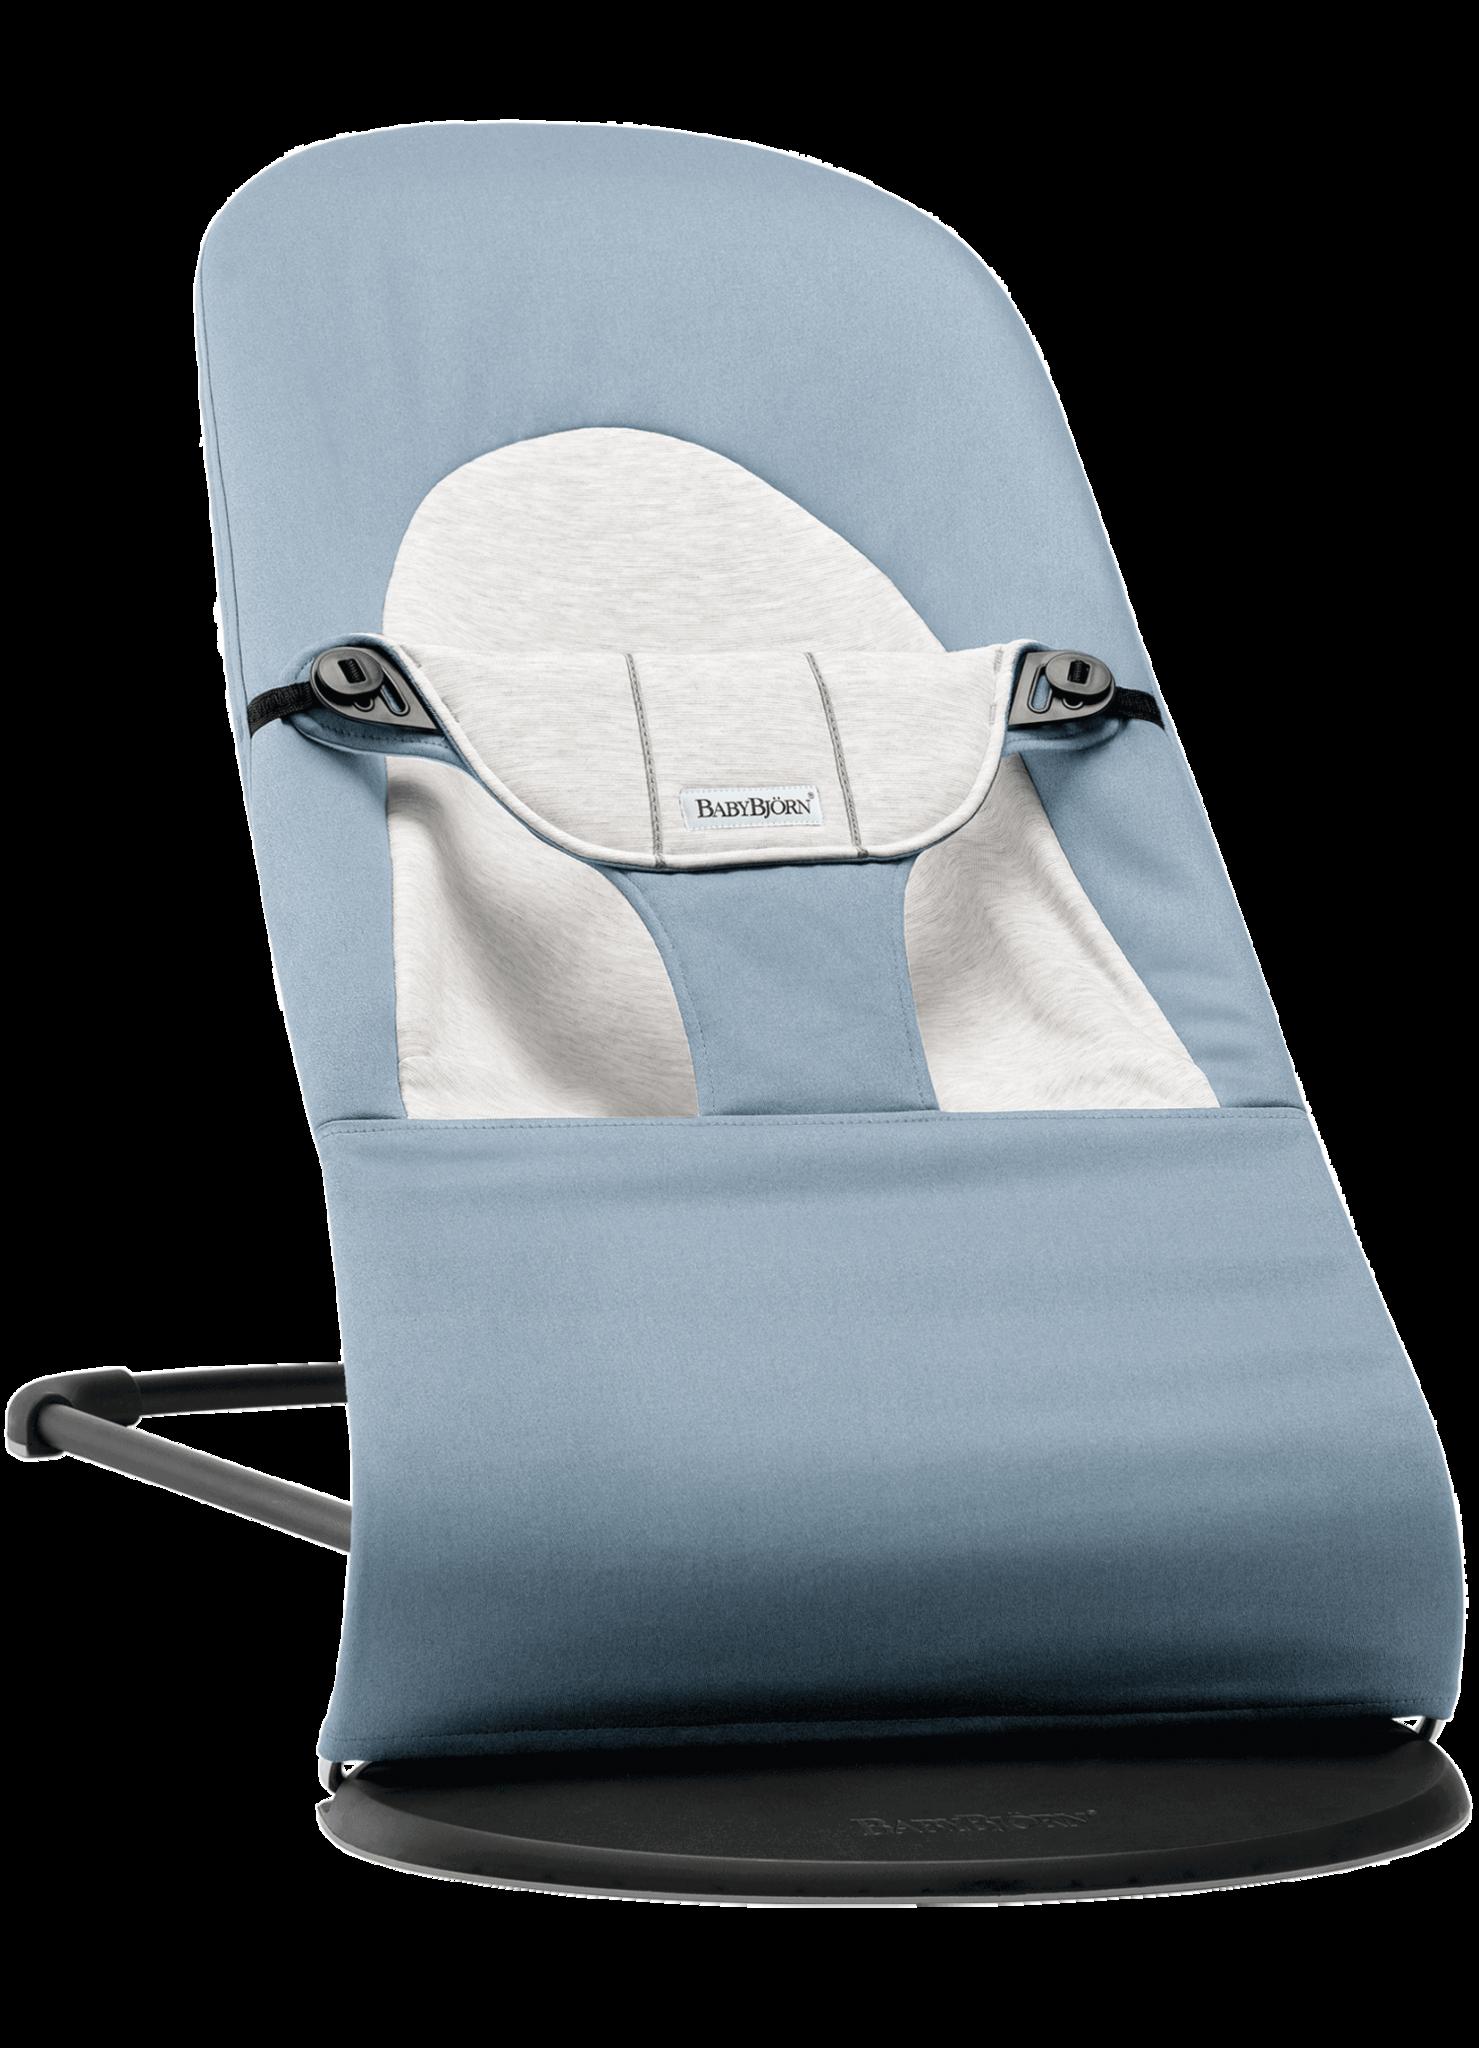 BABYBJÖRN BABYBJÖRN Wipstoeltje Balance Soft Blauw/Grijs, Cotton/Jersey